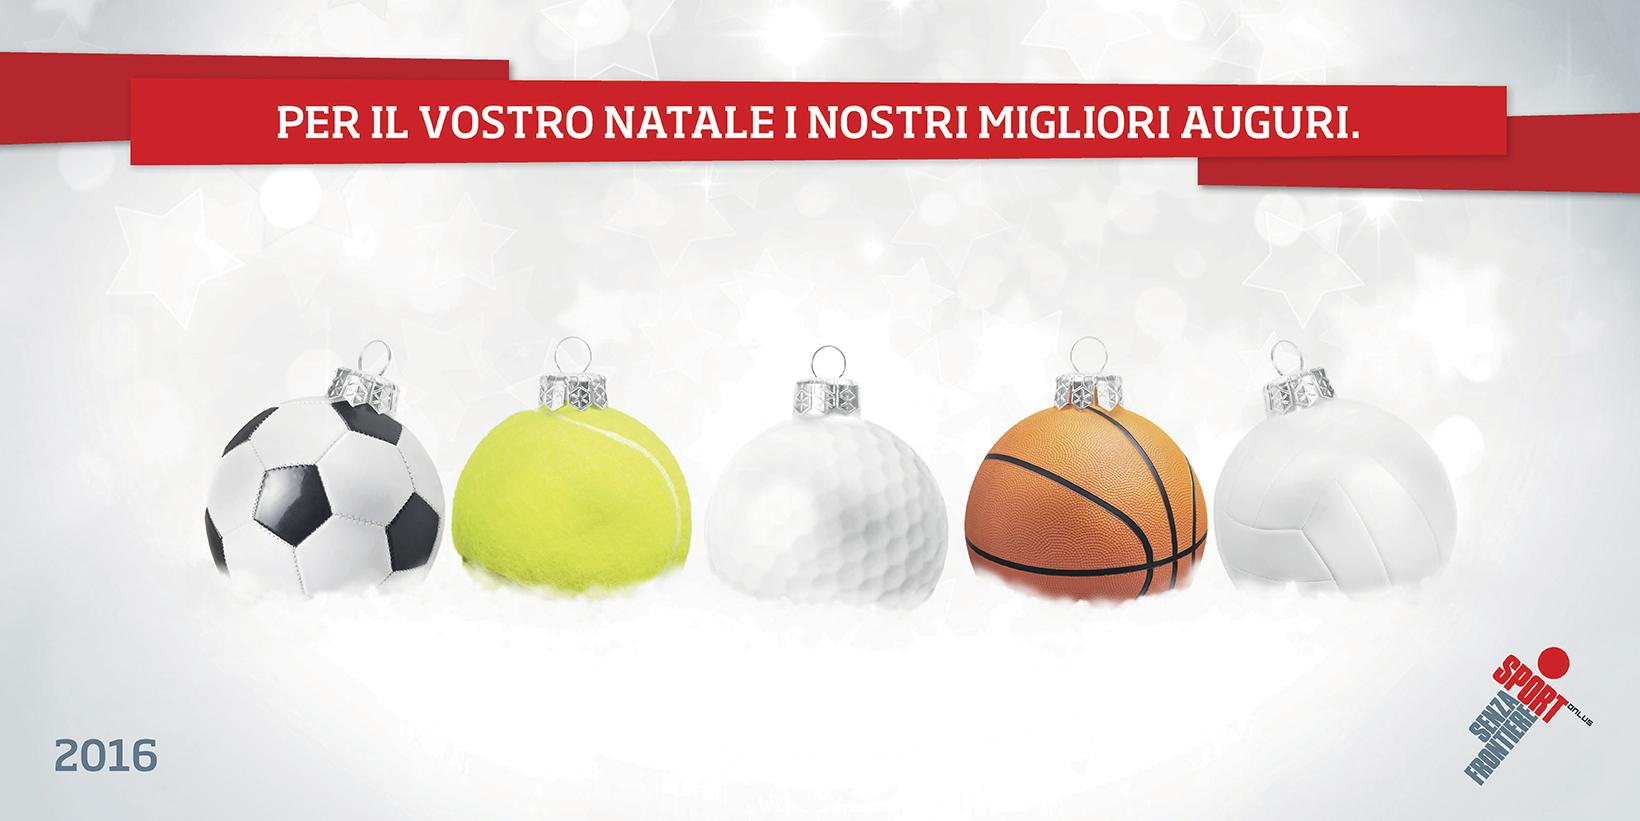 Auguri Natale Sport Senza Frontiere 2016